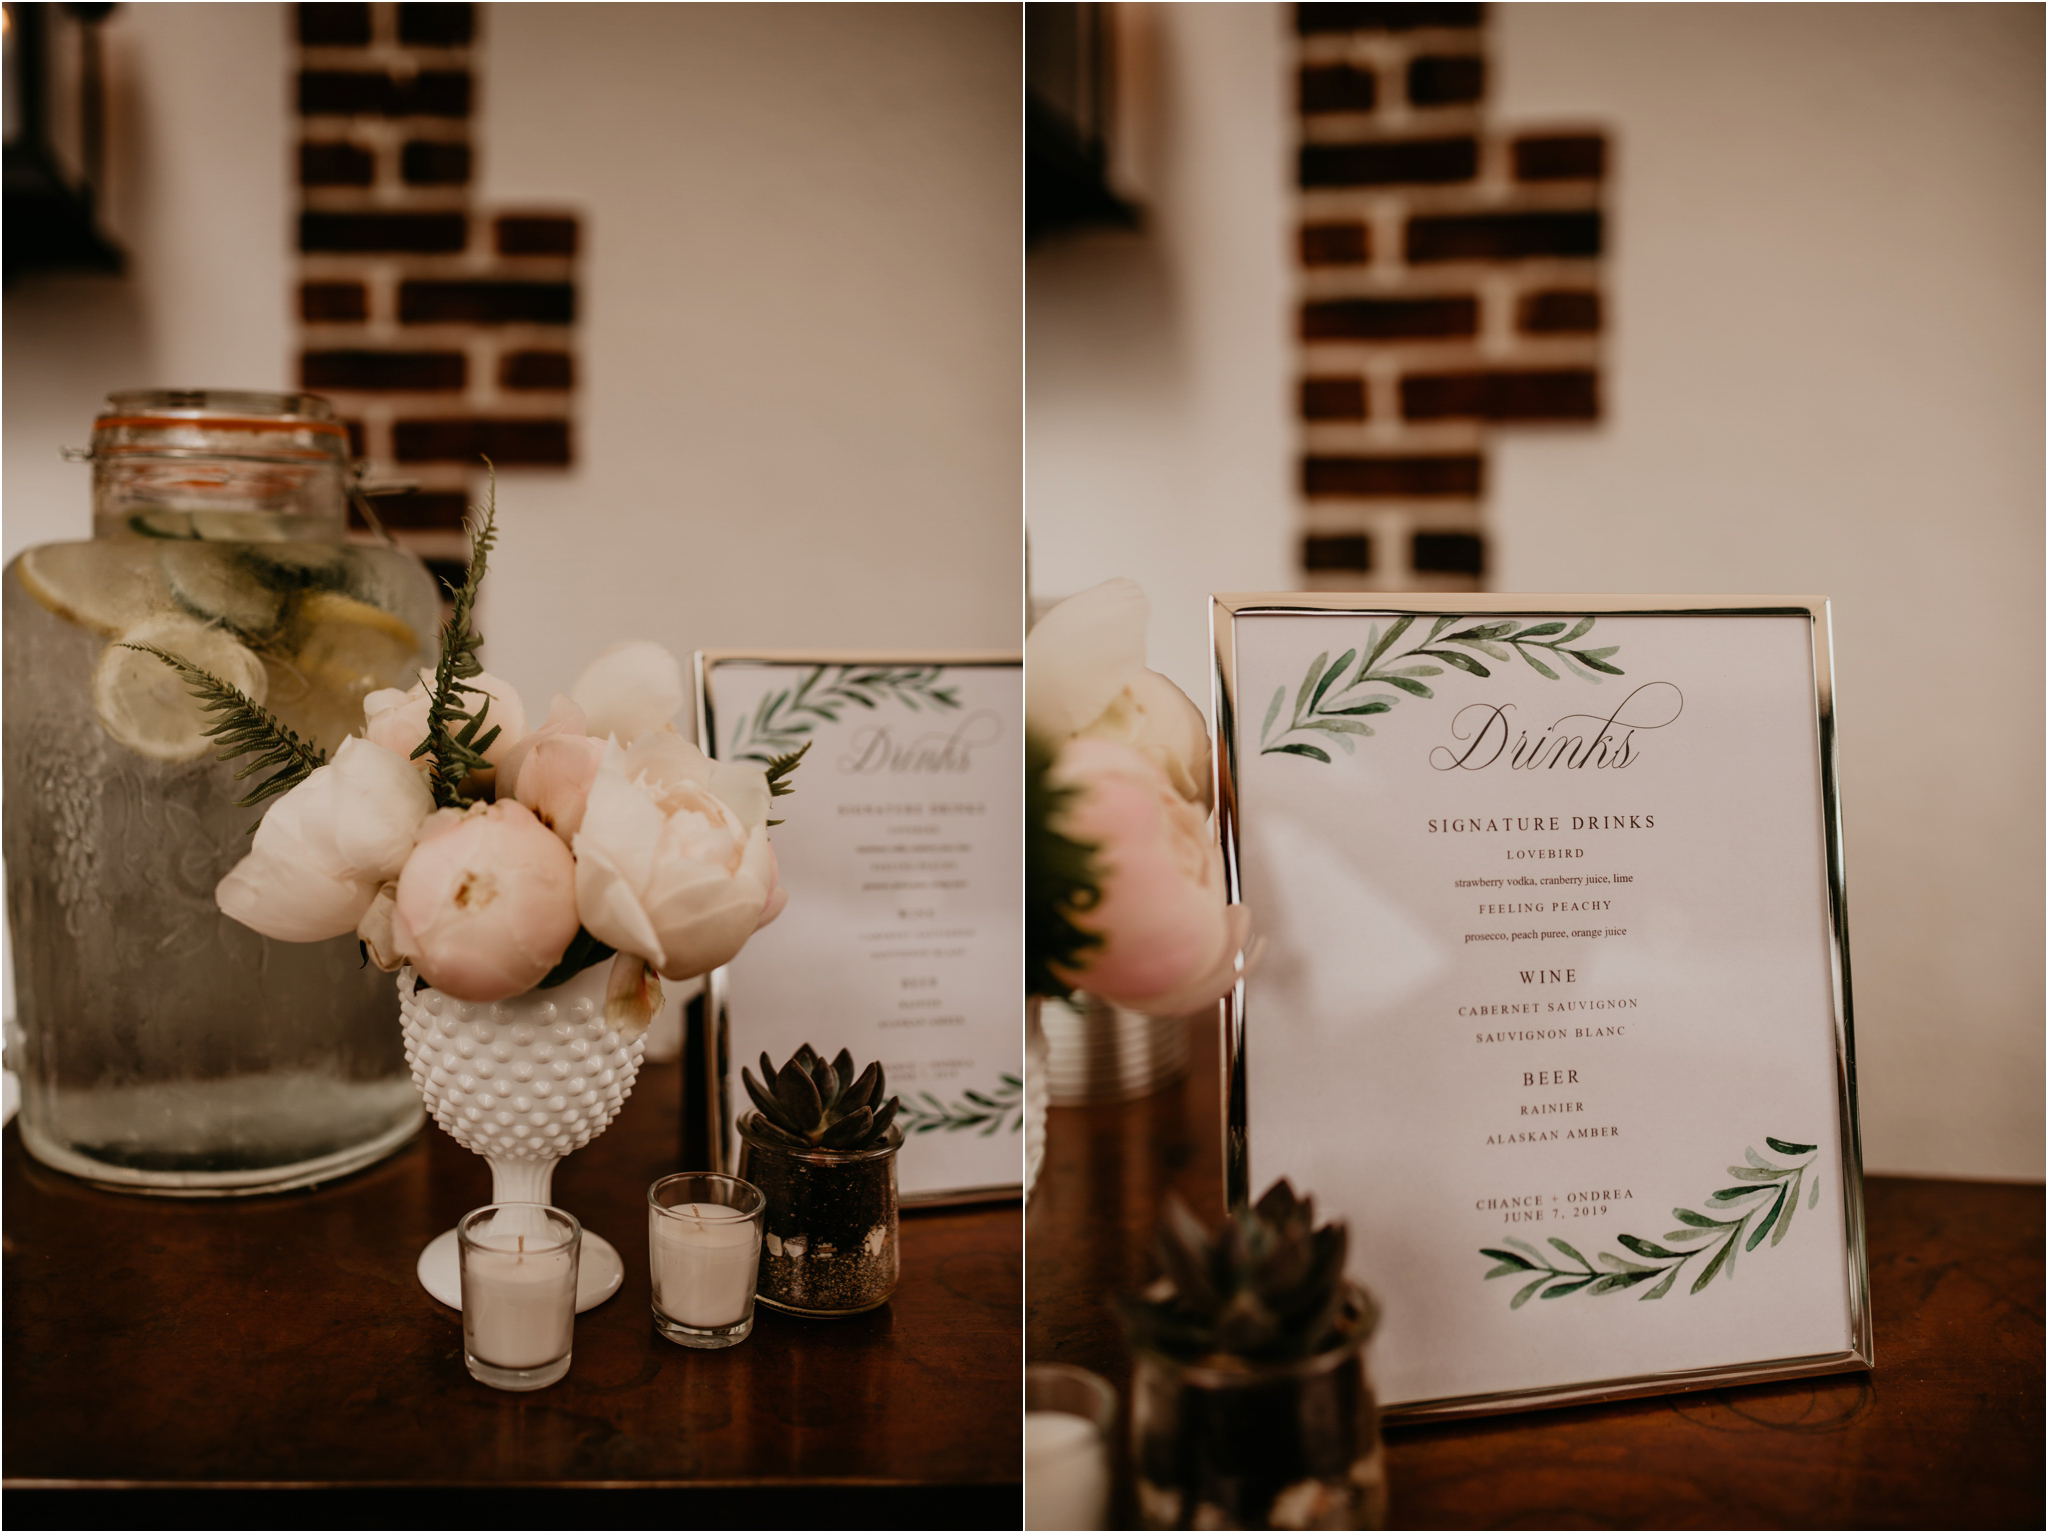 chance-and-ondrea-lairmont-manor-wedding-seattle-photographer-069.jpg